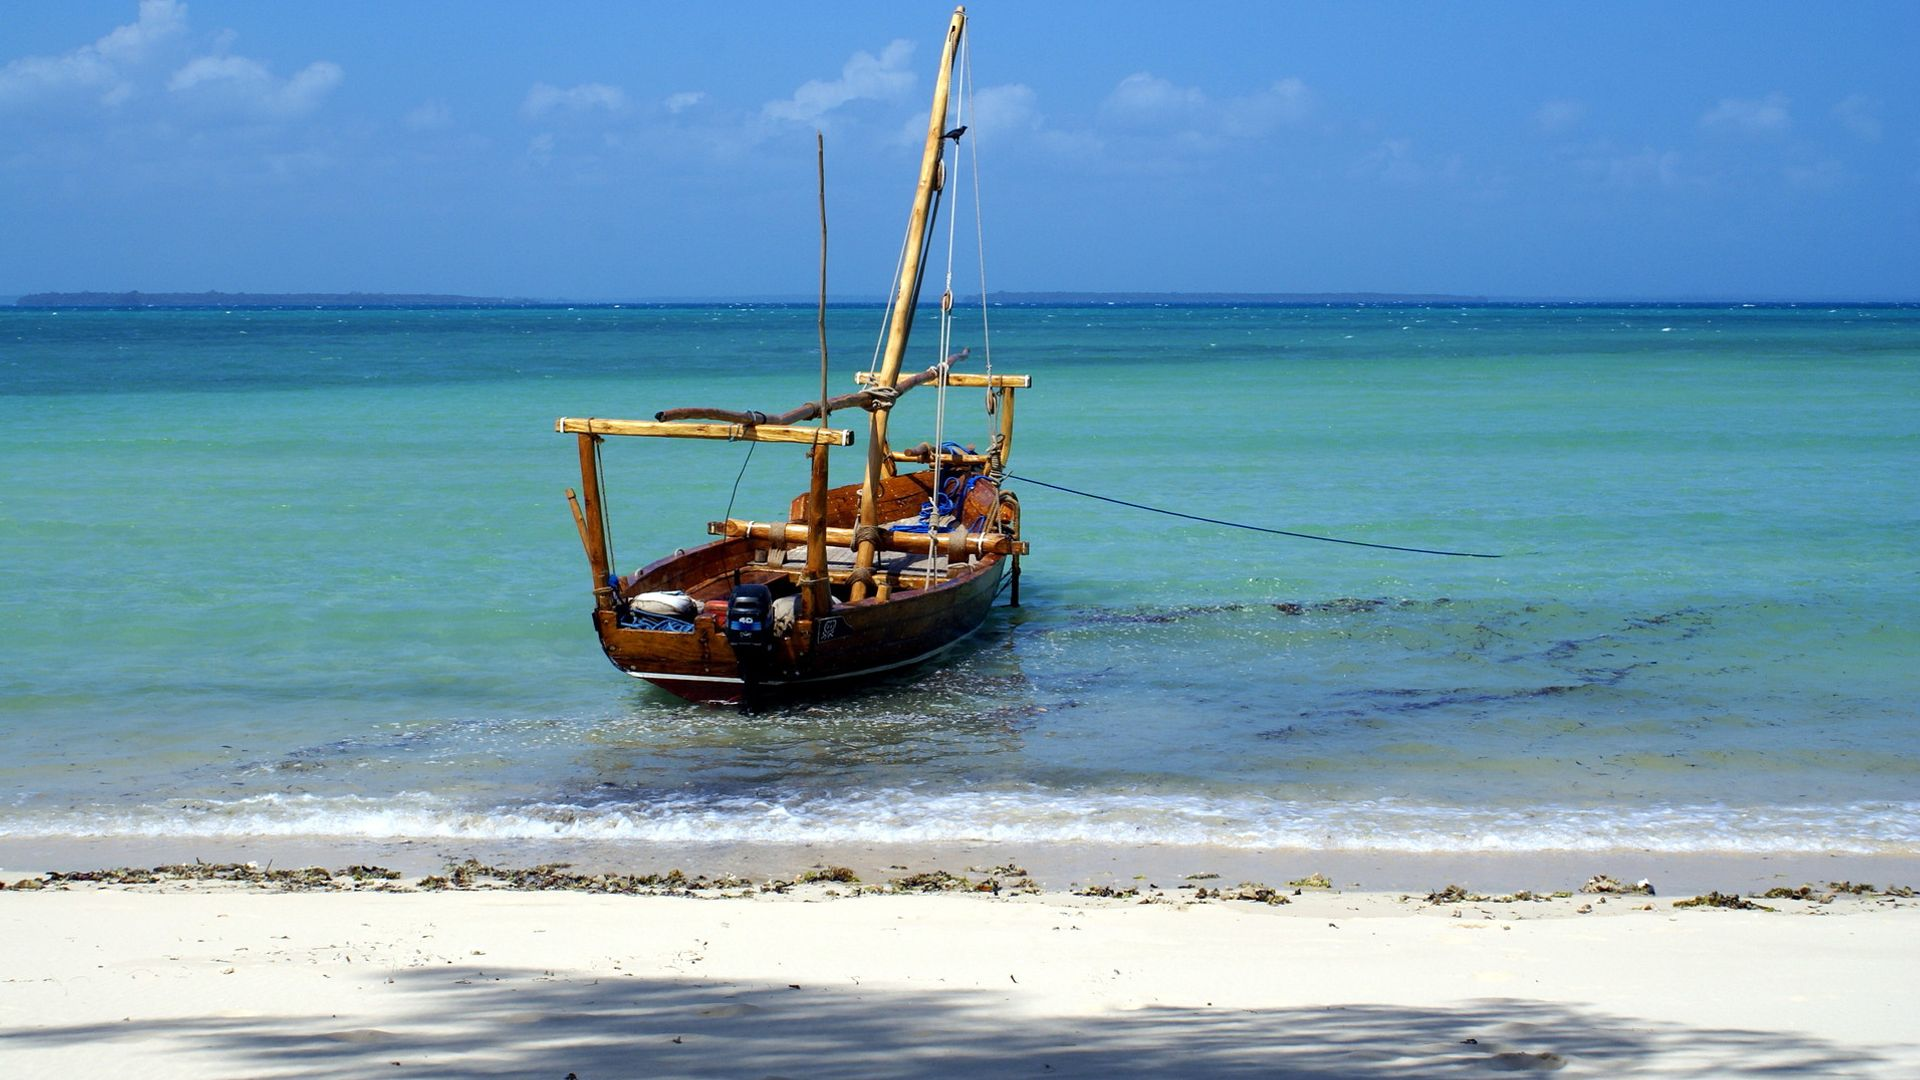 Sejur plaja Zanzibar, Tanzania - 21 octombrie 2021